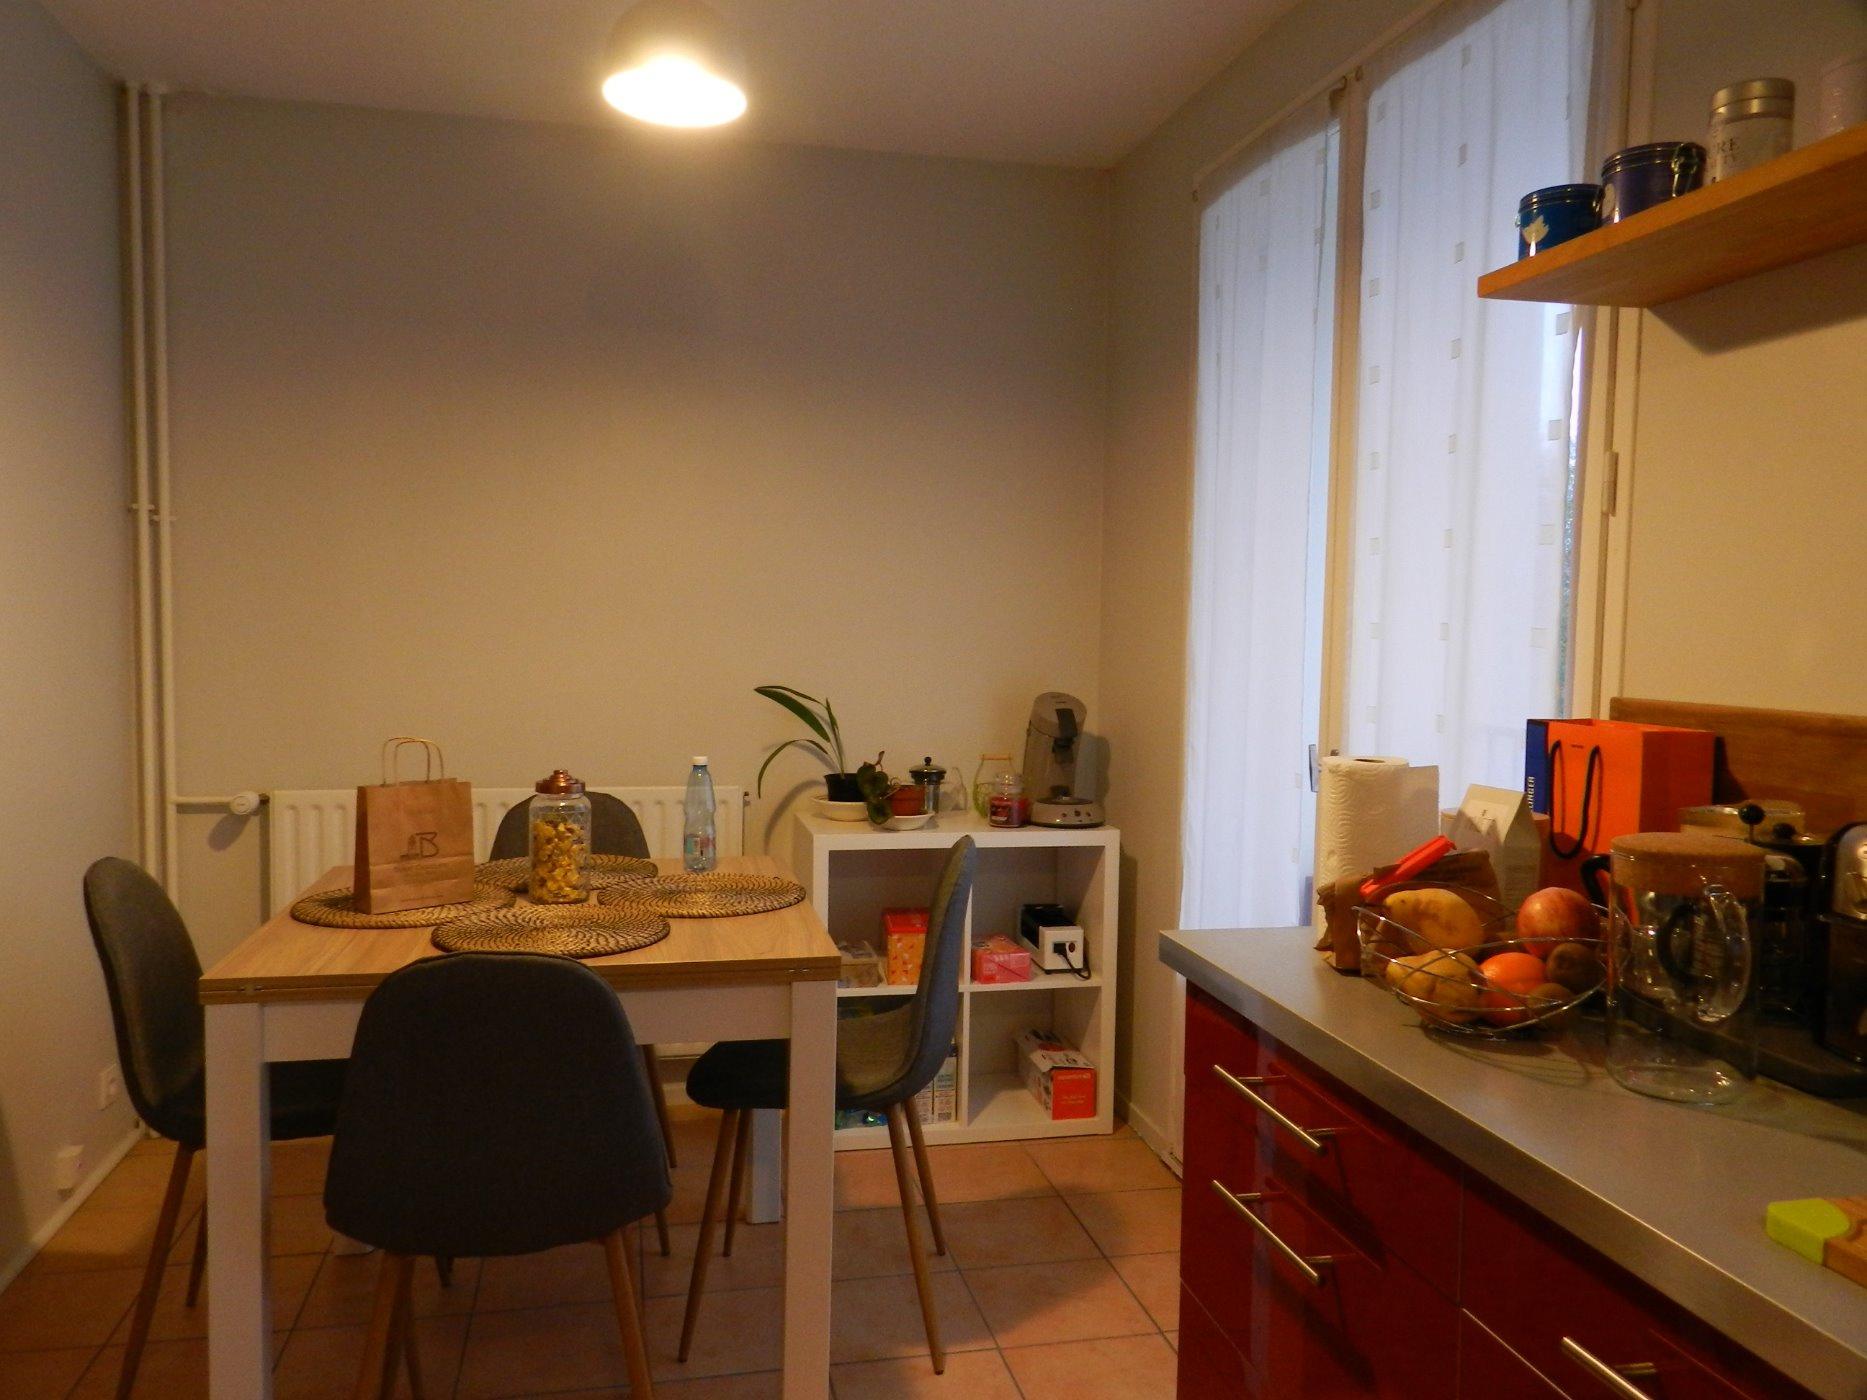 vente angers catho appartement t2. Black Bedroom Furniture Sets. Home Design Ideas